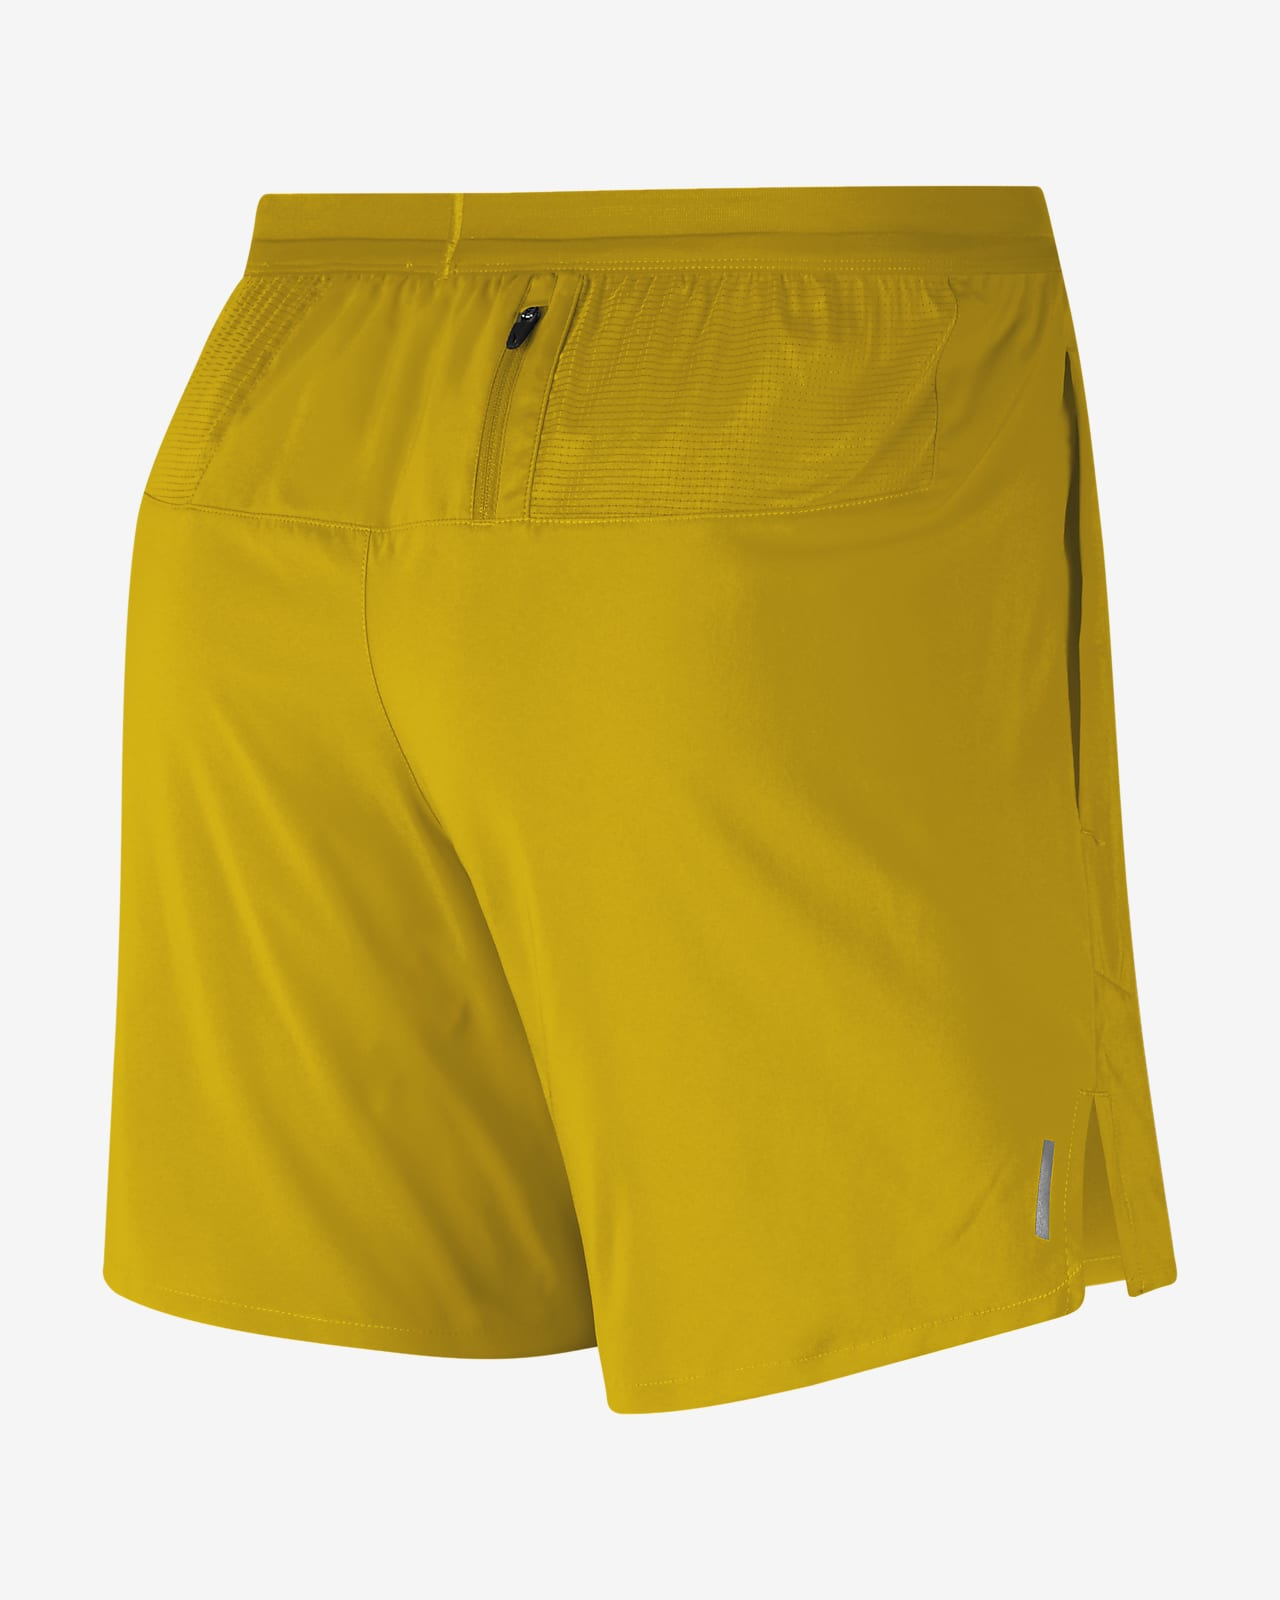 Nike Flex Stride Men's 7